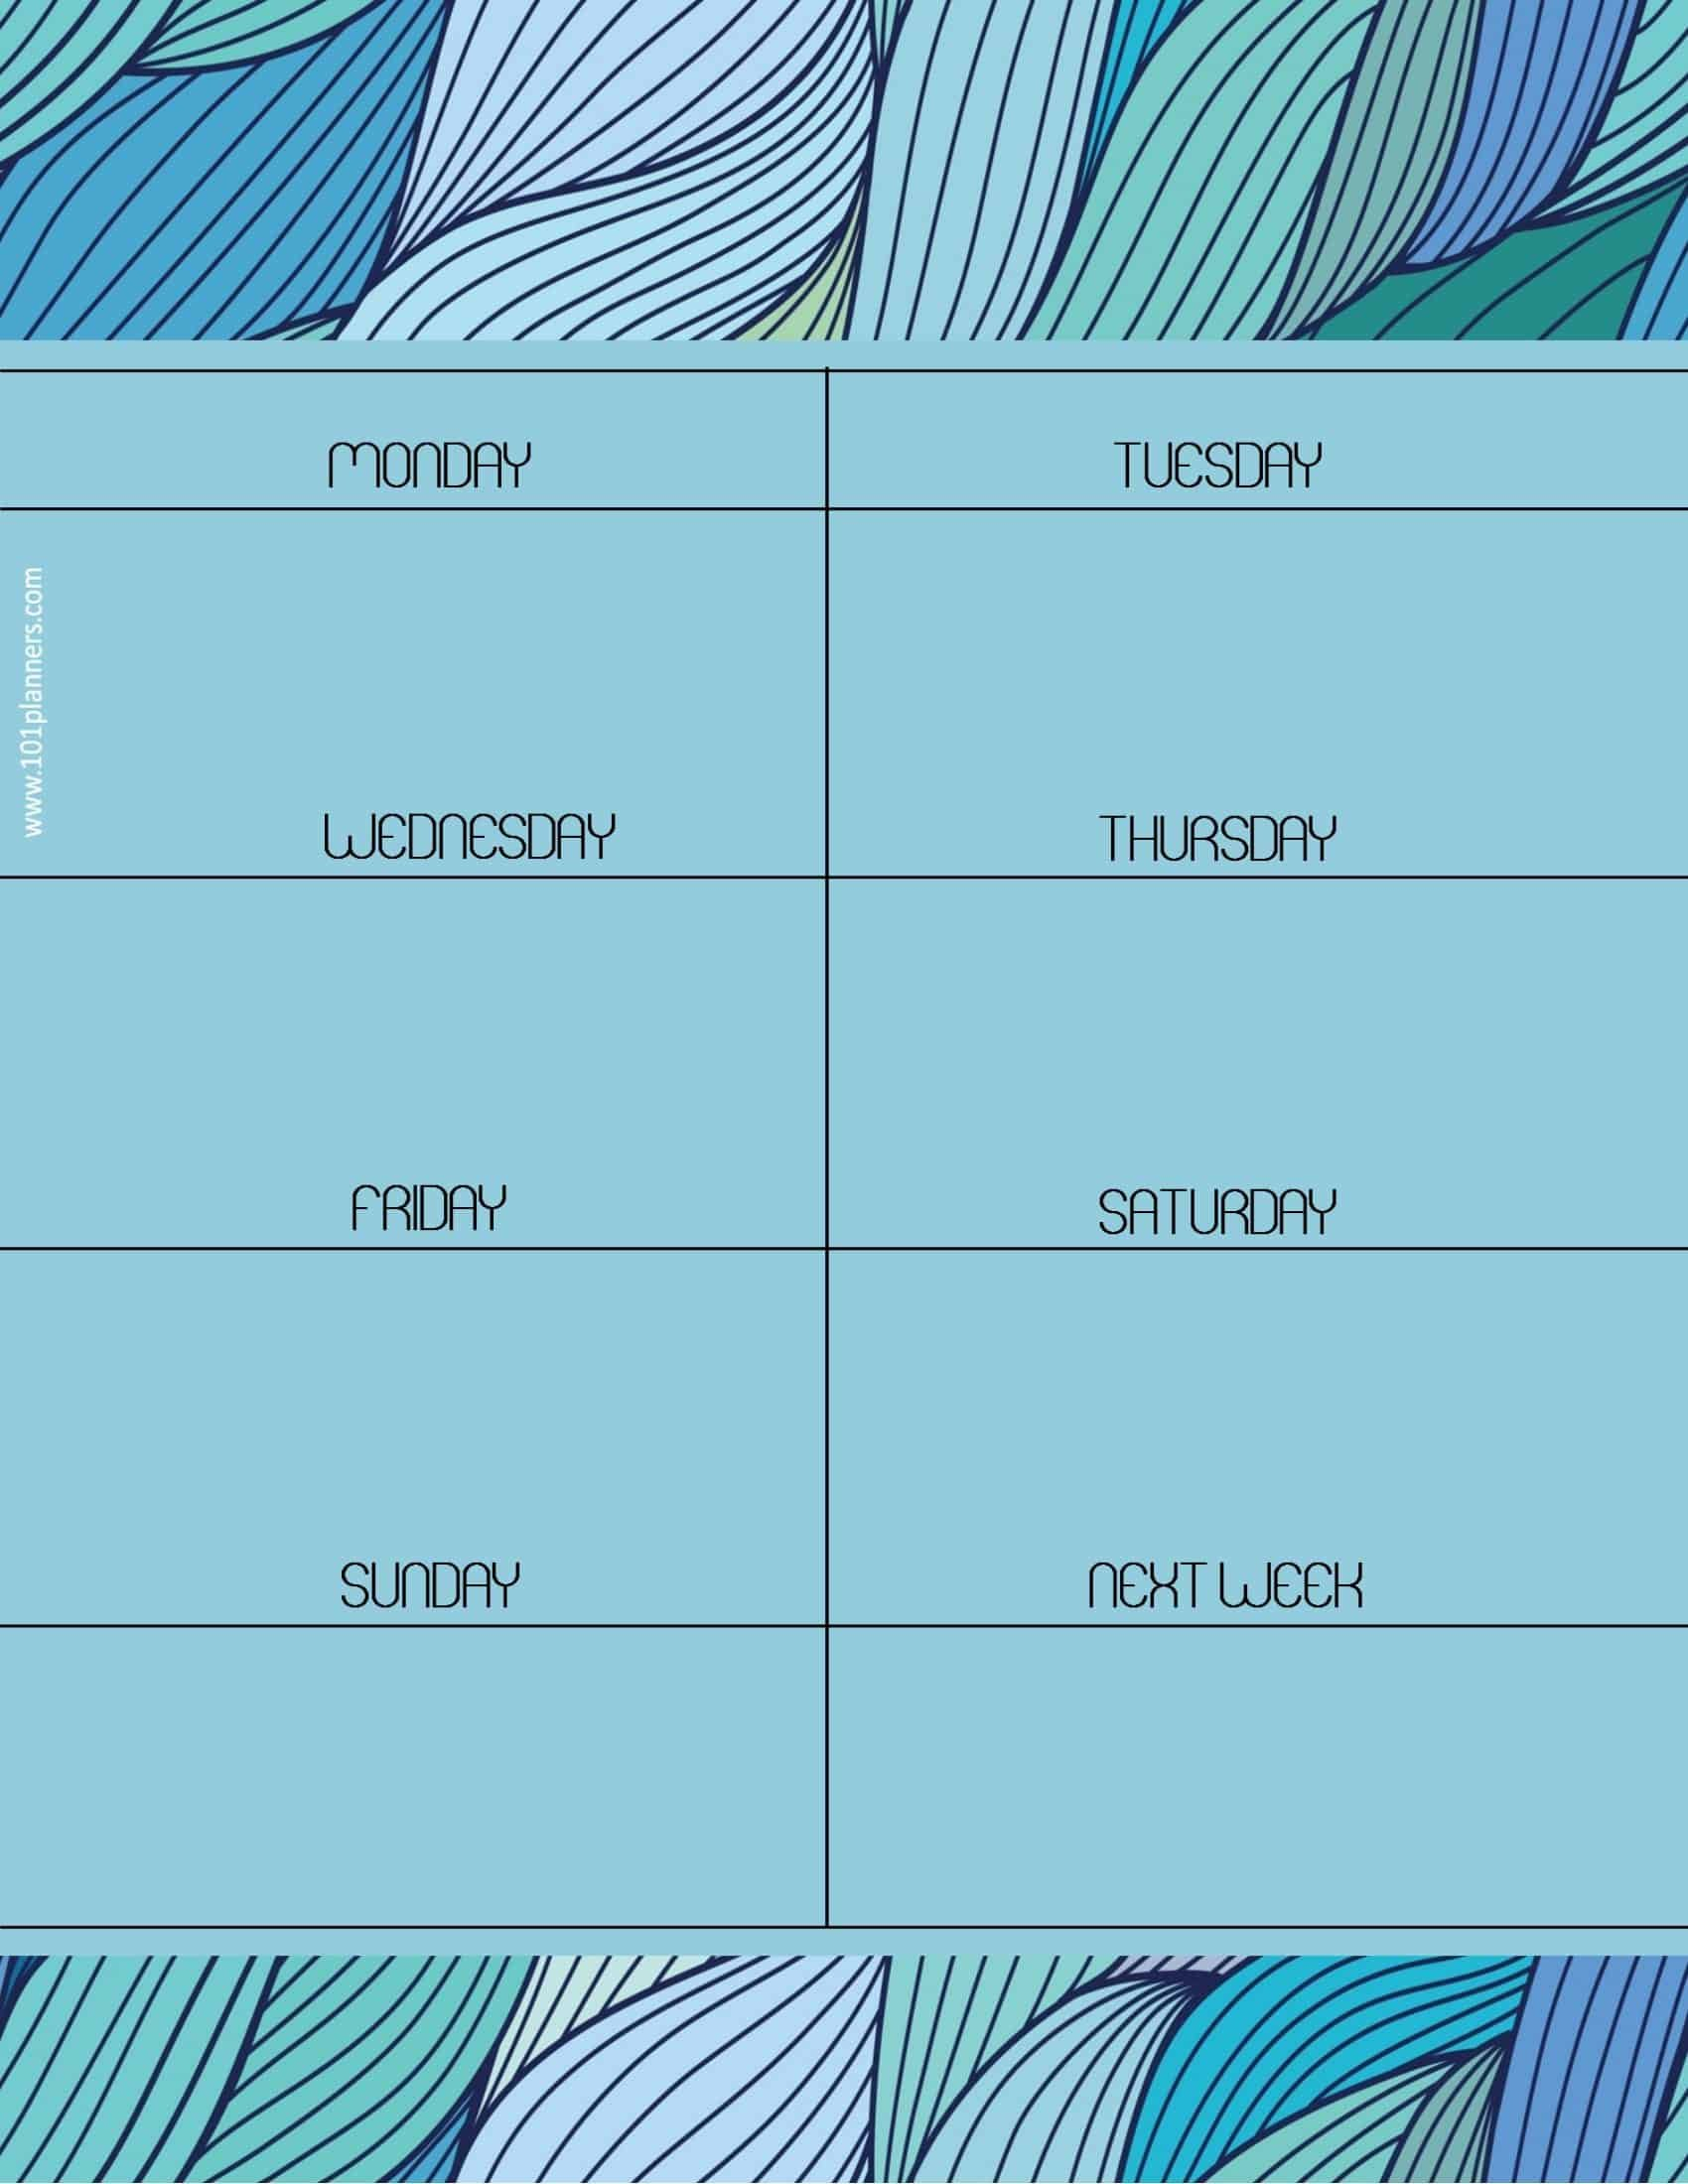 Weekly Calendar Maker | Create Free Custom Calendars Free Week Calendar Editable